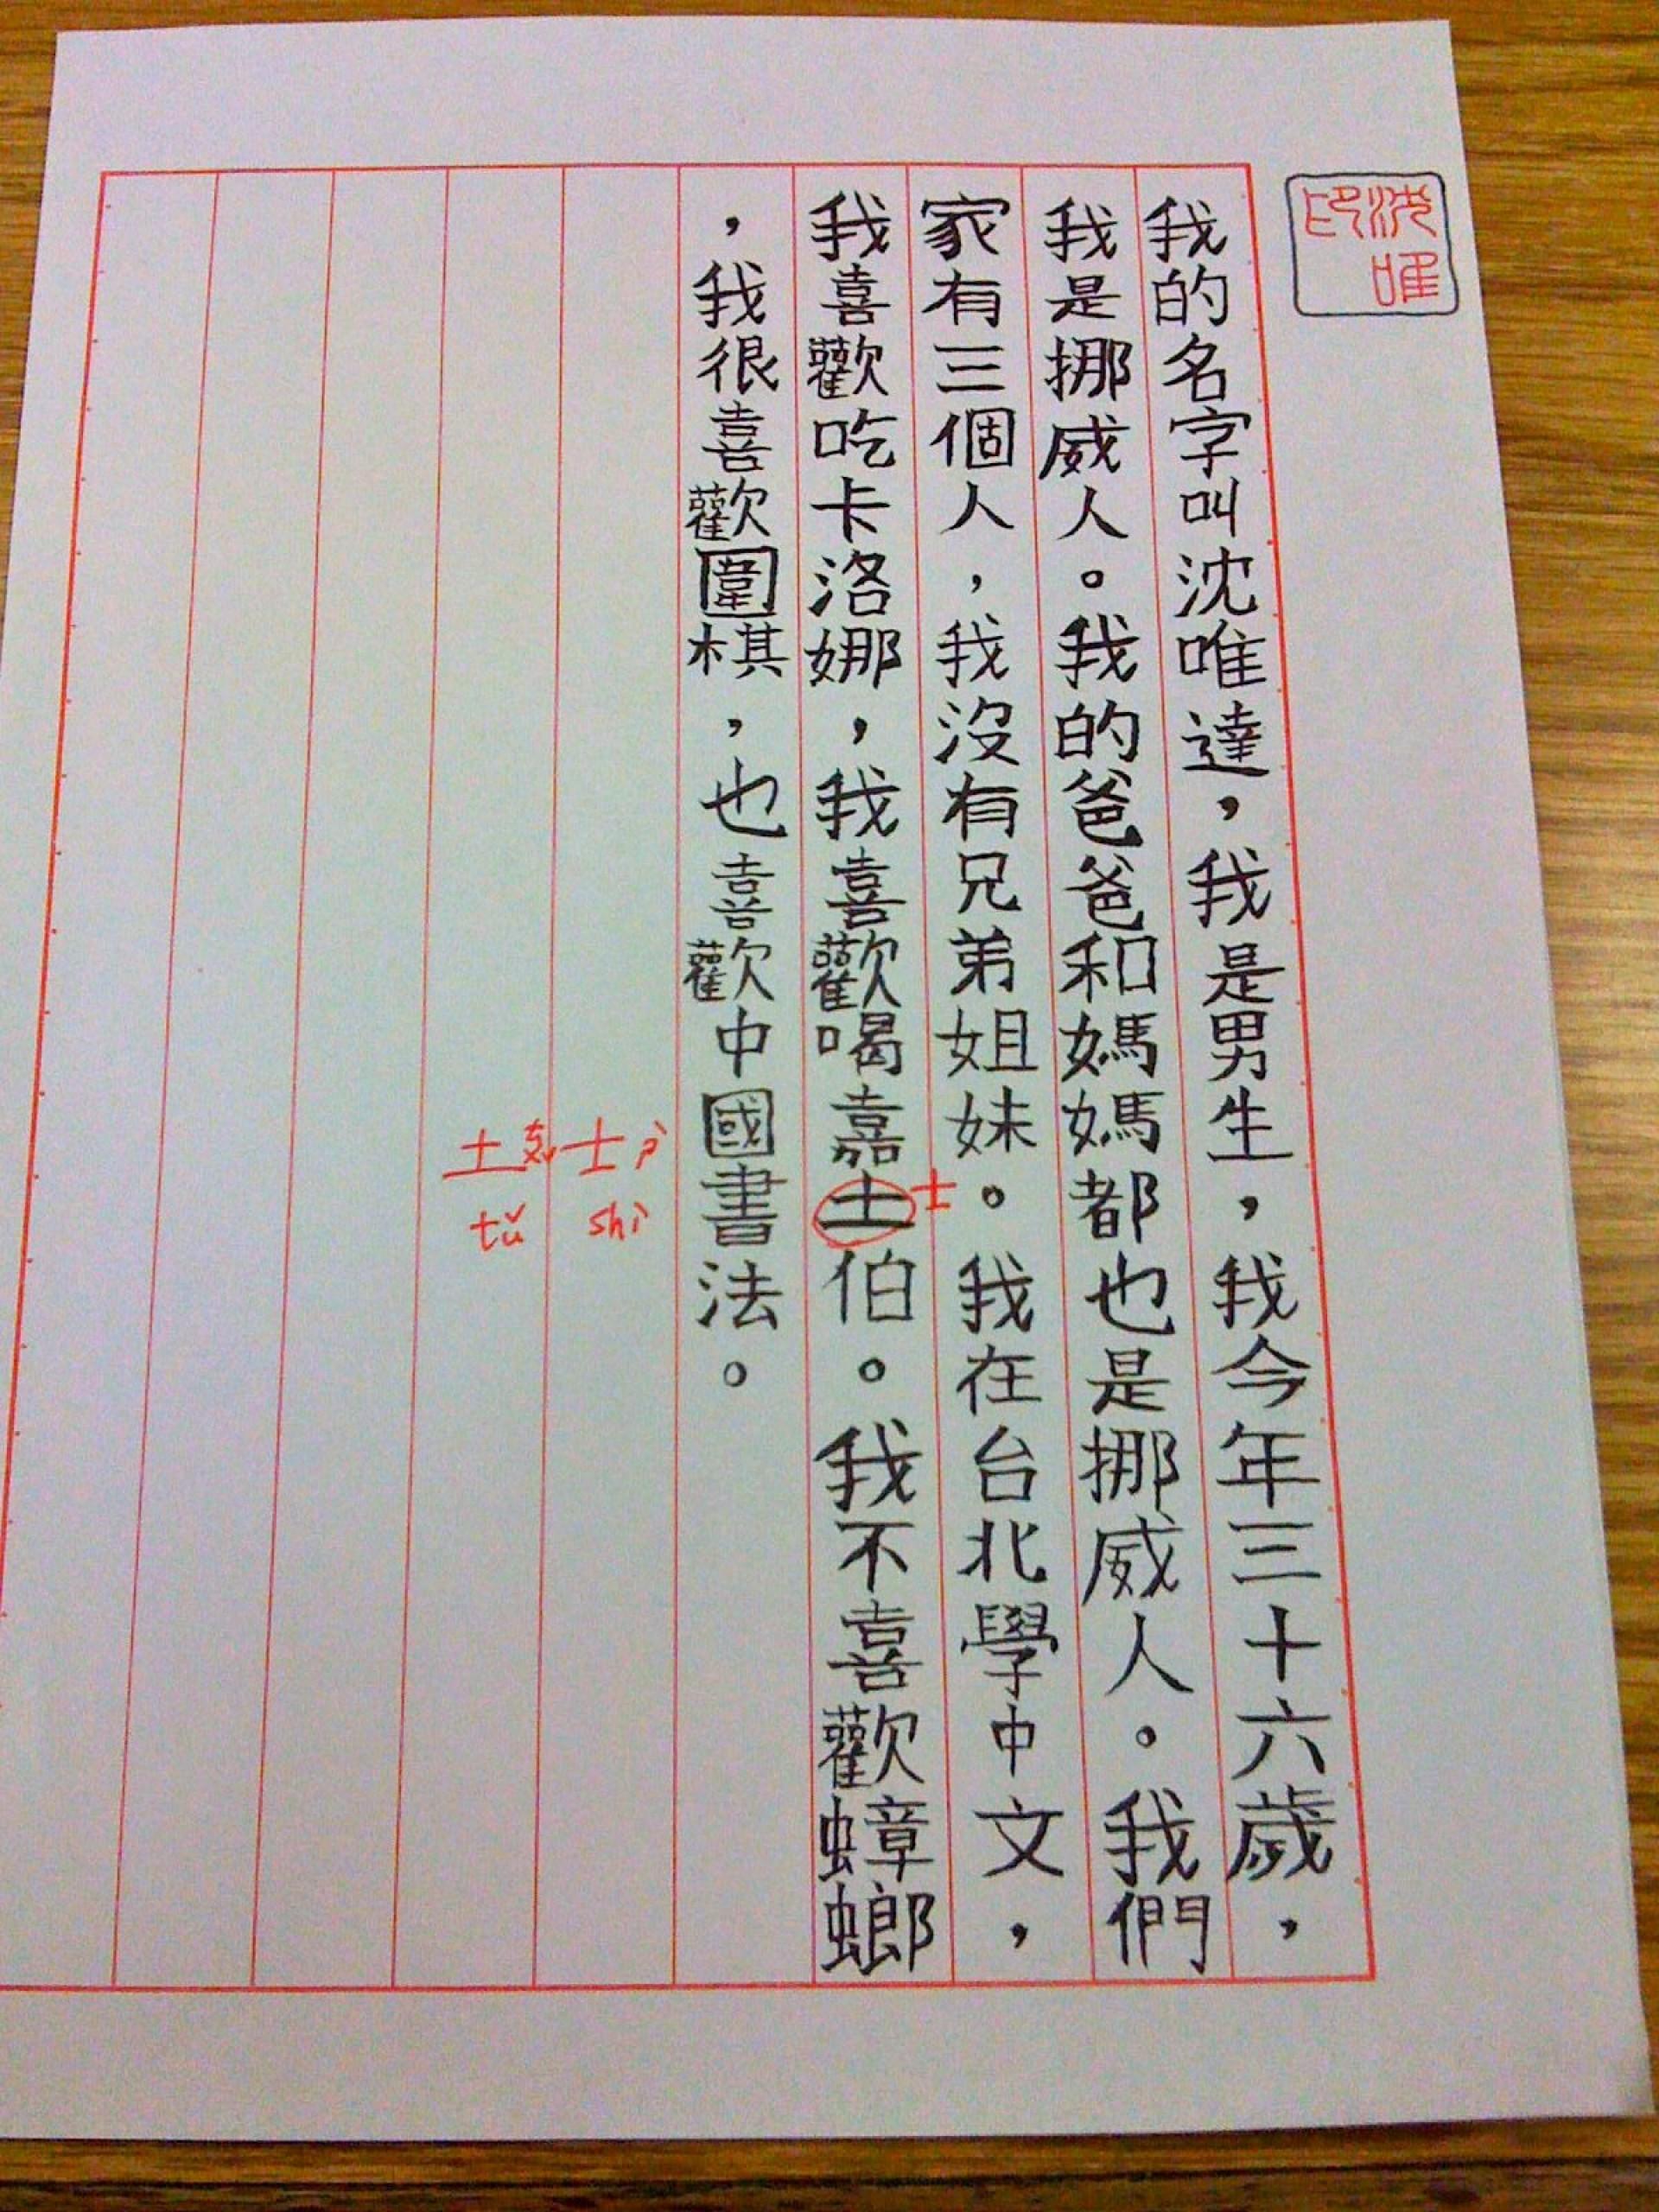 016 Essay Chinese Amazing Art Topics Vce Formats Sheet 1920